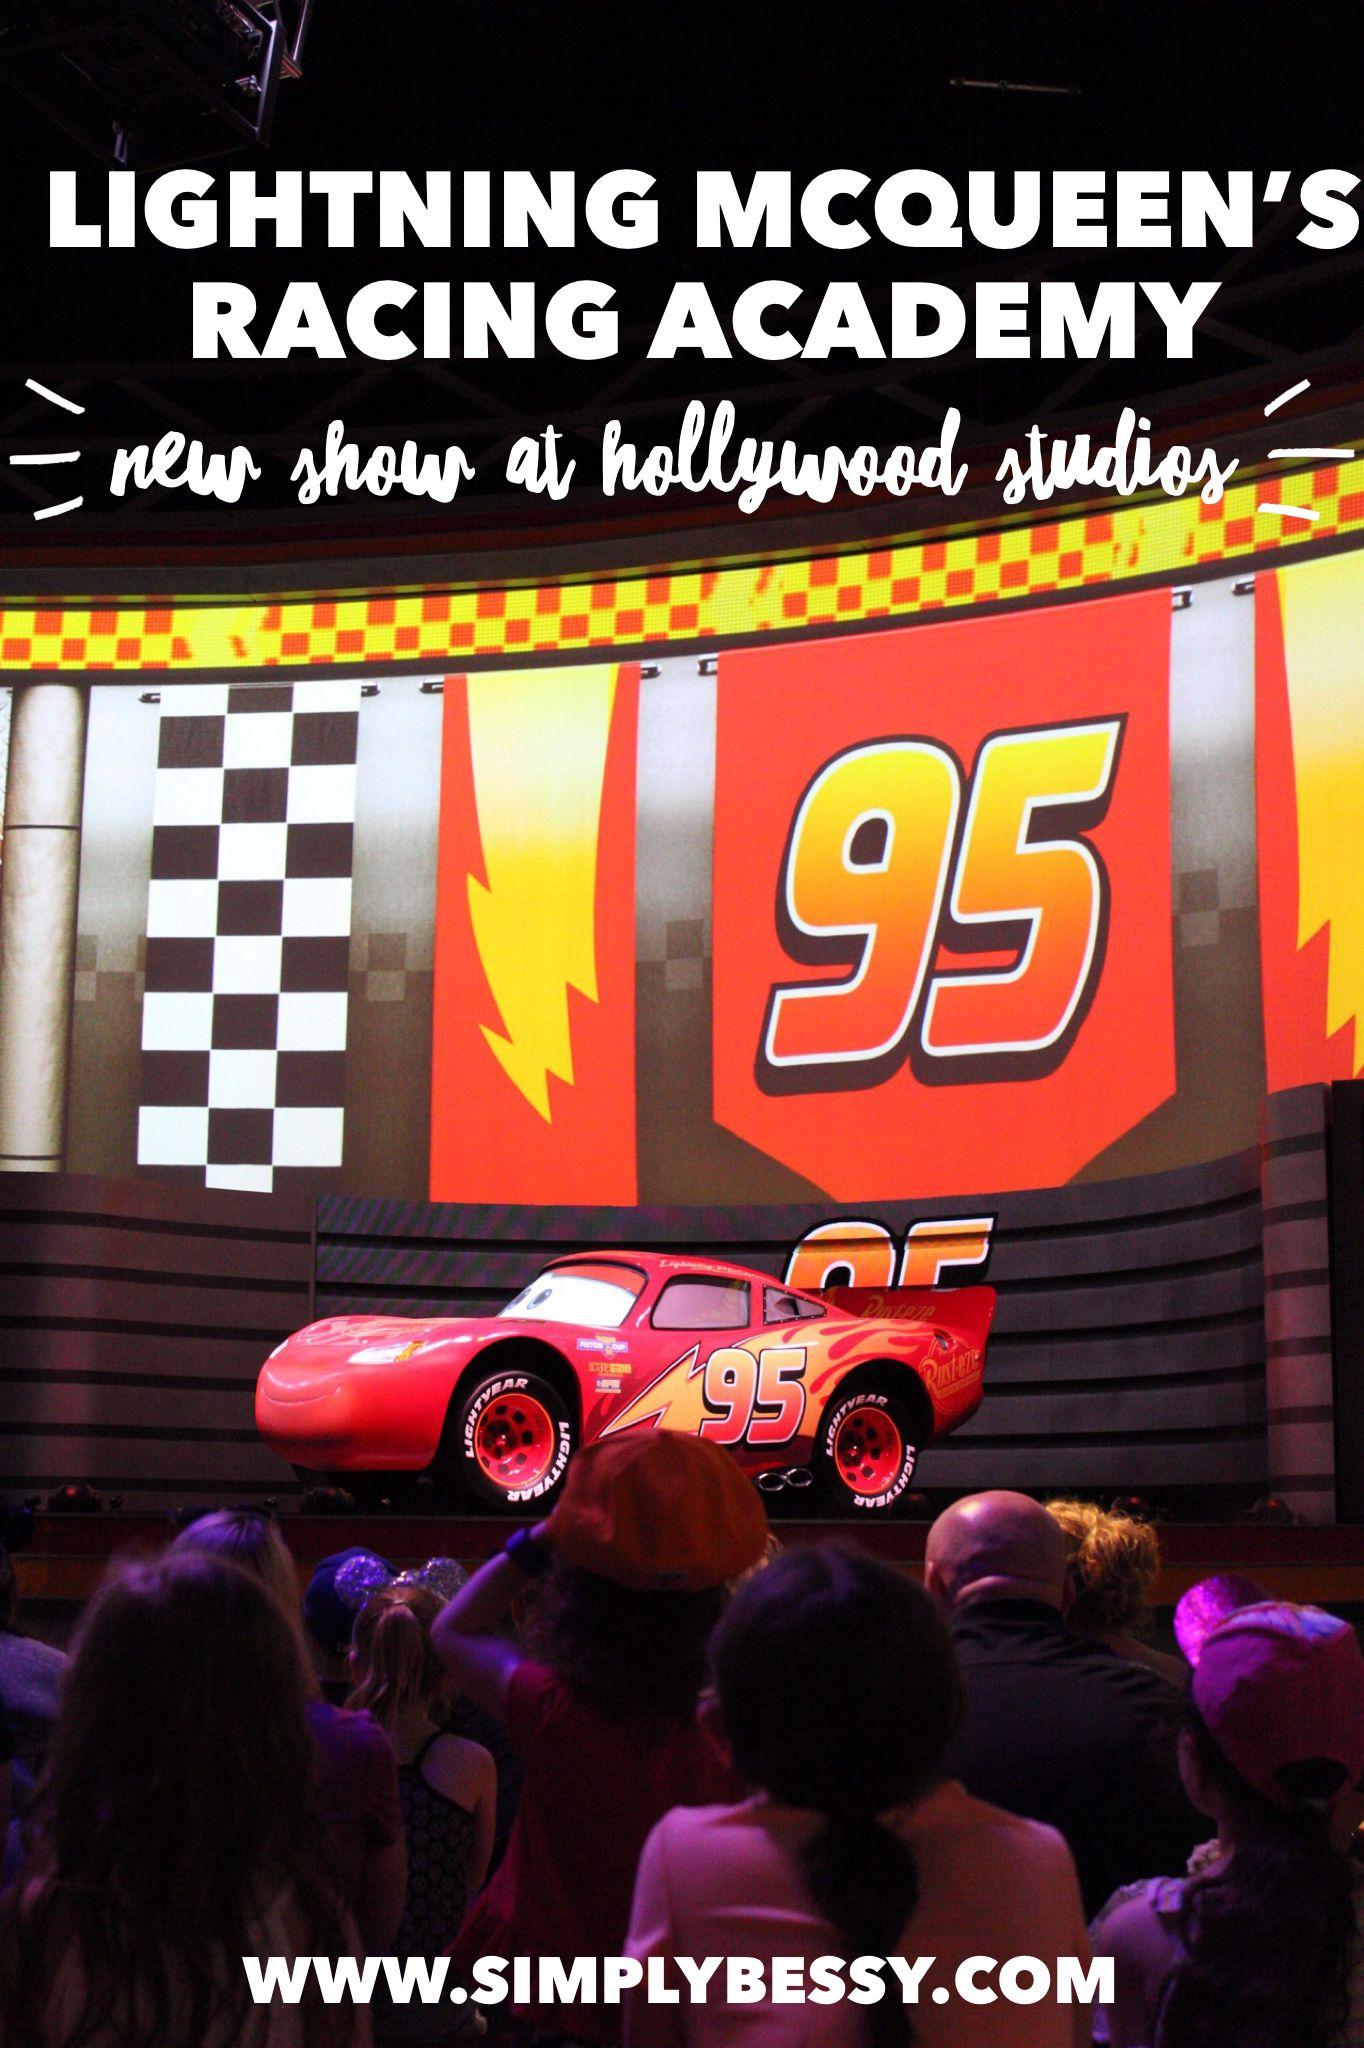 Lightning Mcqueen S Racing Academy Lightning Mcqueen New Shows Hollywood Studios